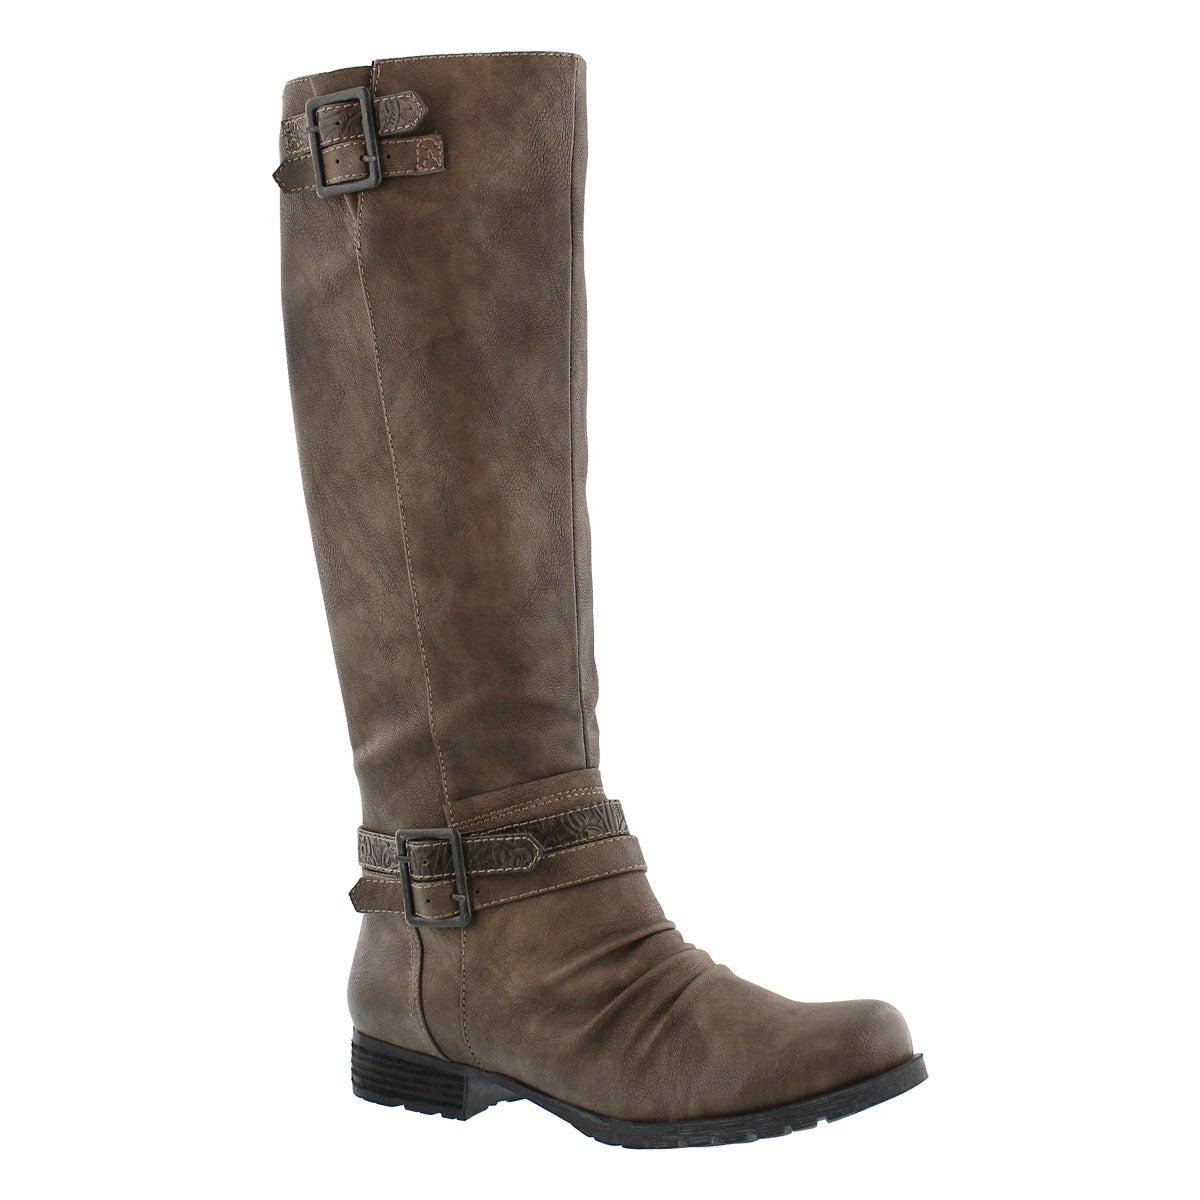 Lds Blixi II grey riding boot